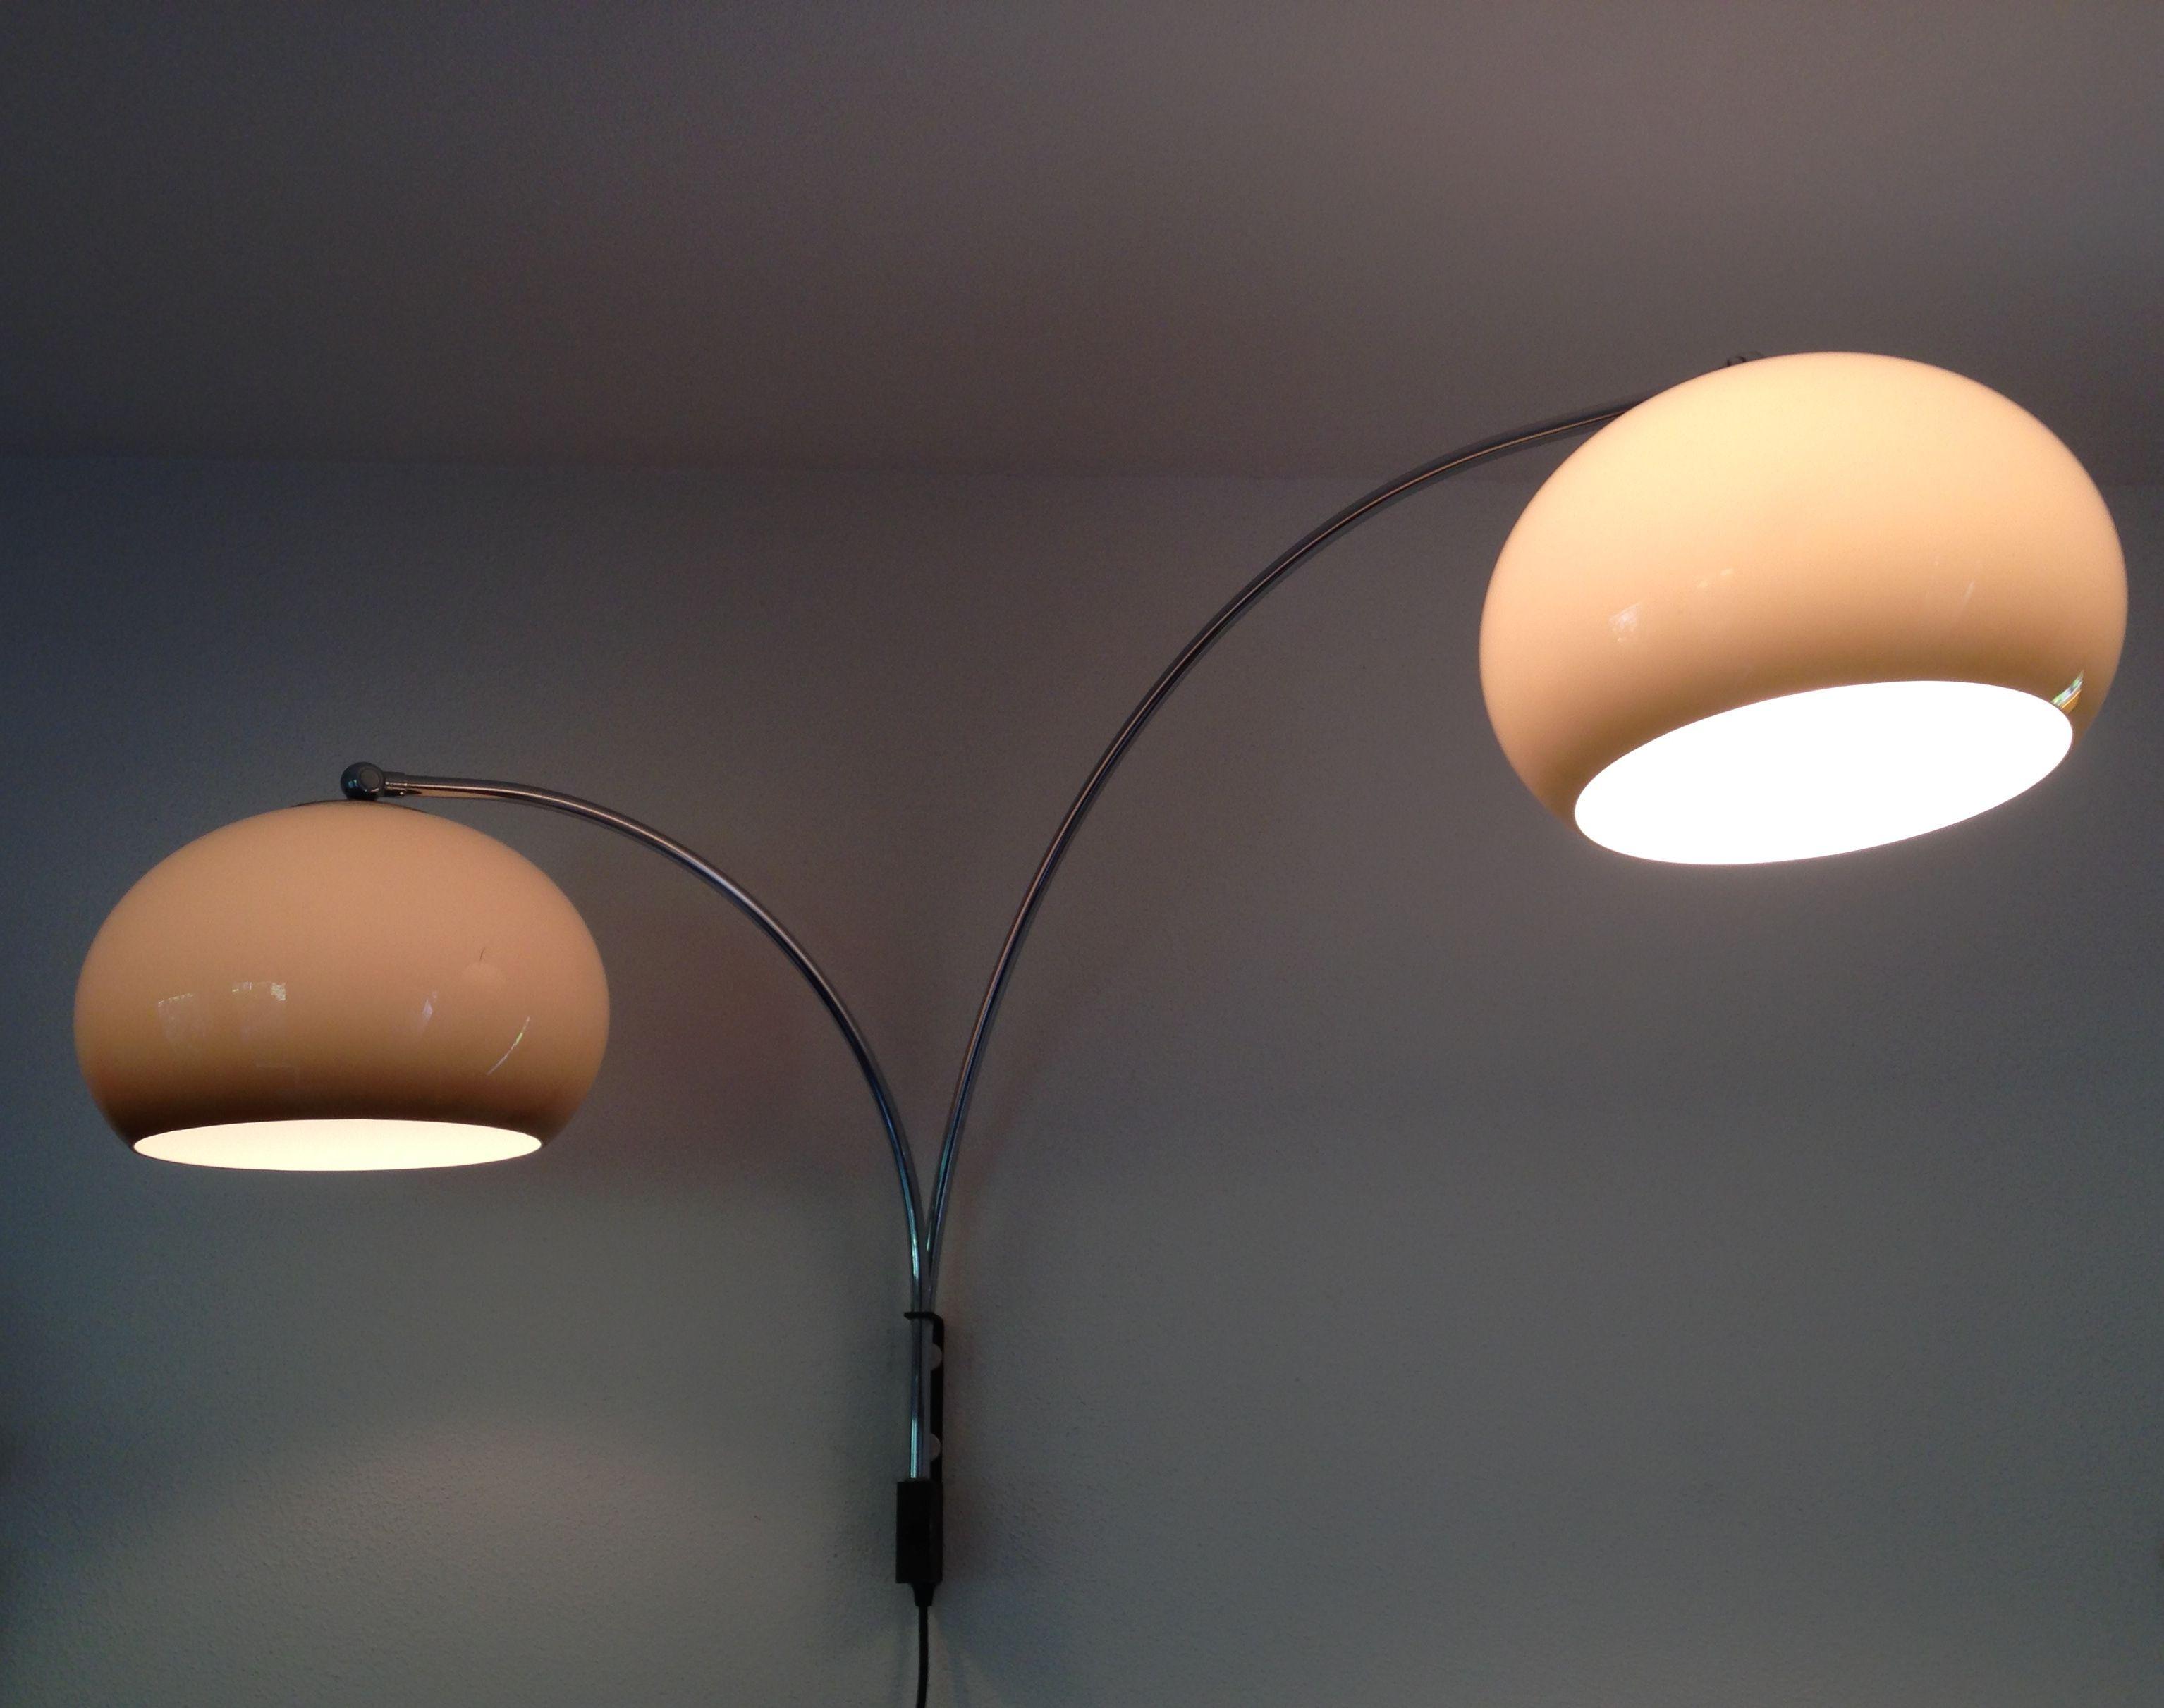 Retro wandlamp Retro booglamp Vintage wall lamp Dijktra